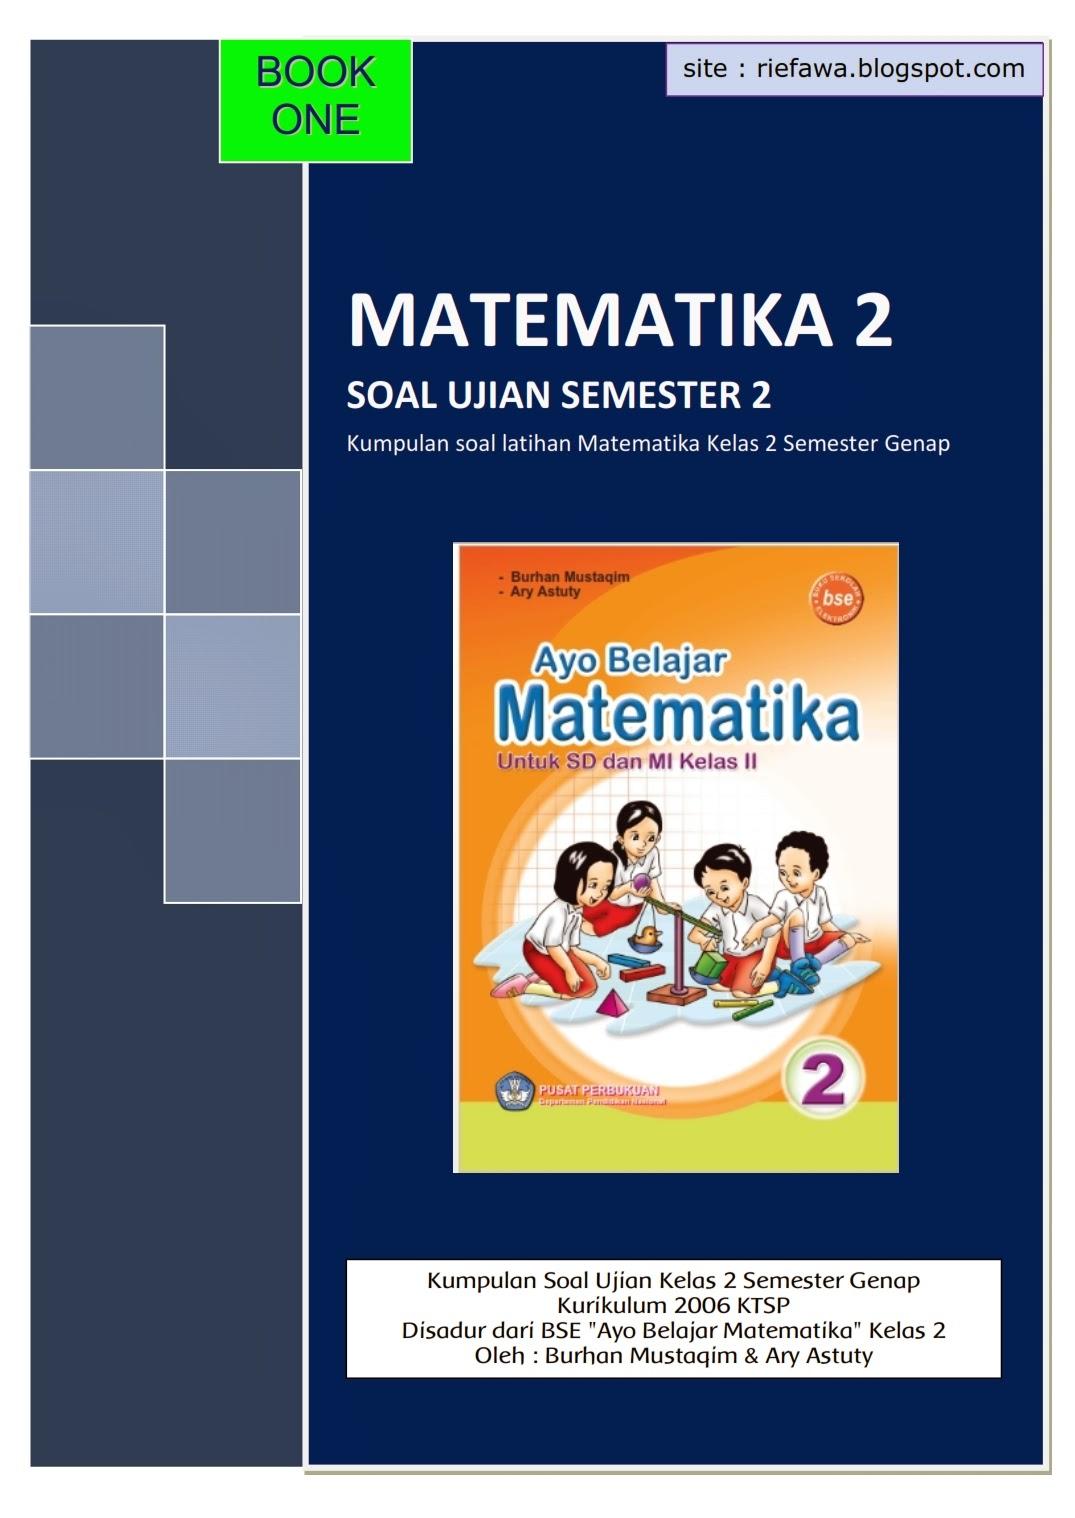 Download Kumpulan Soal Matematika Kelas 2 Semester 2 Book 1 Rief Awa Blog Download